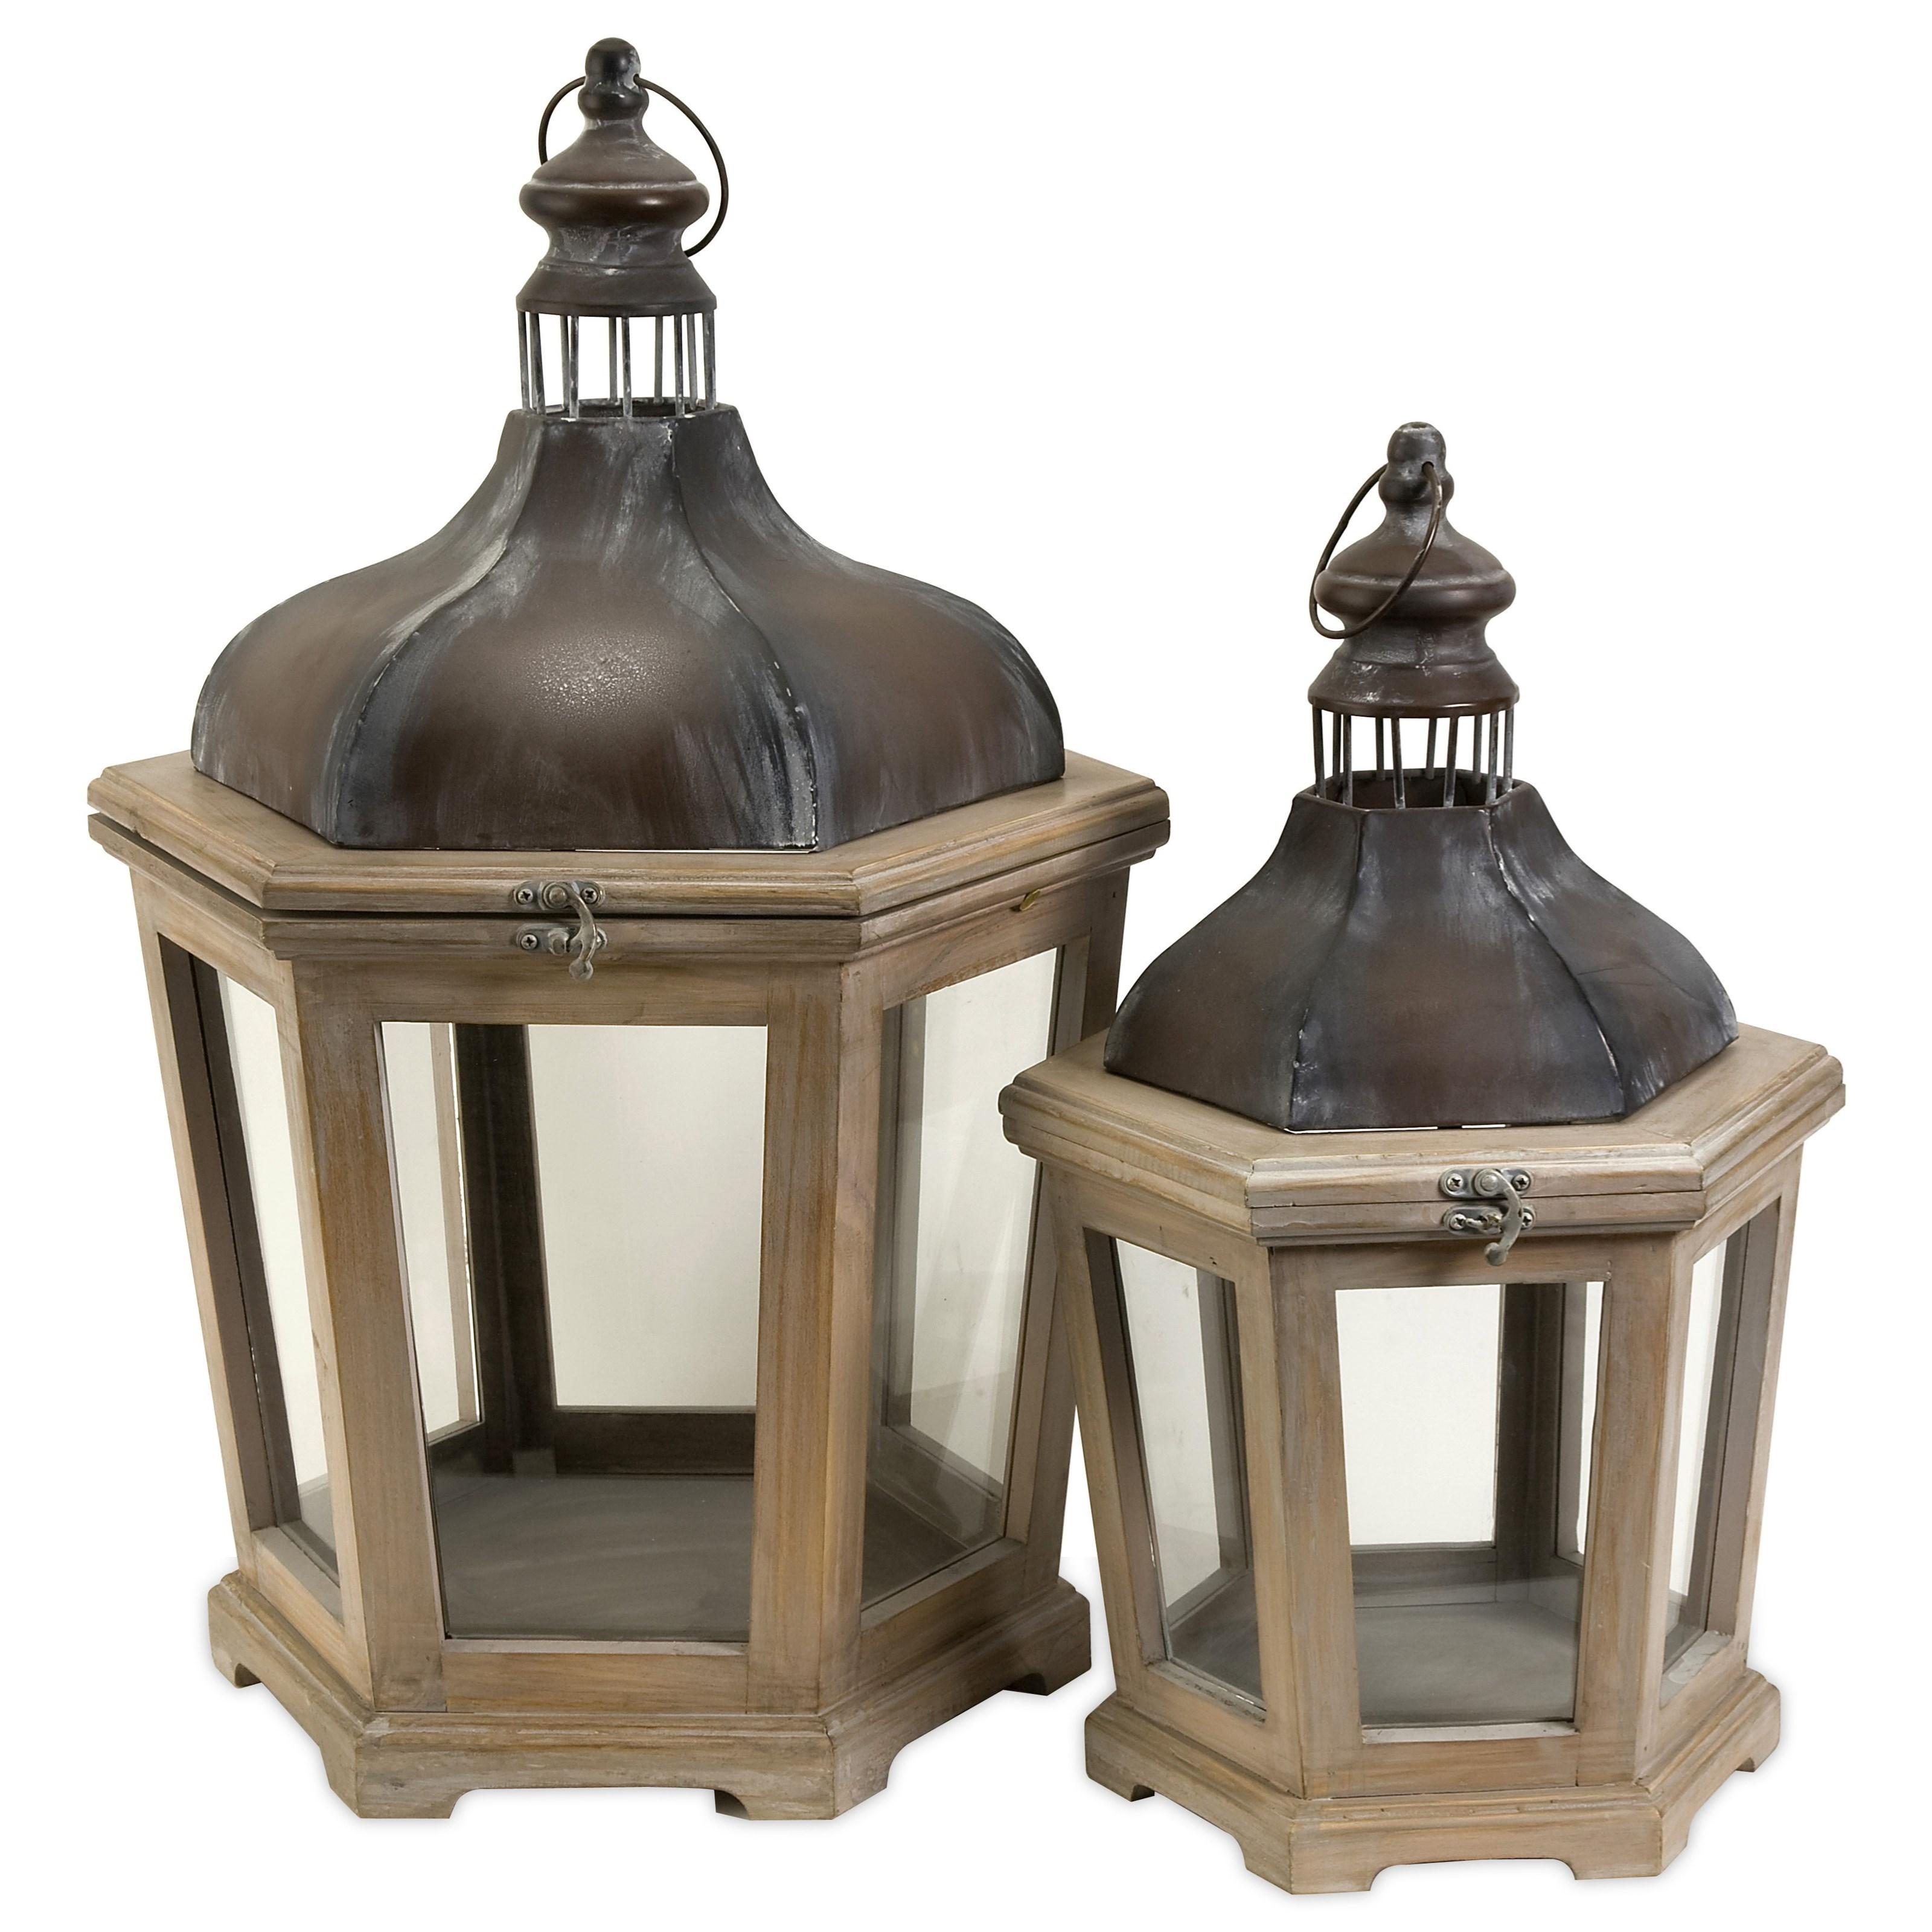 Pomeroy Wood and Metal Lanterns - Set of 2